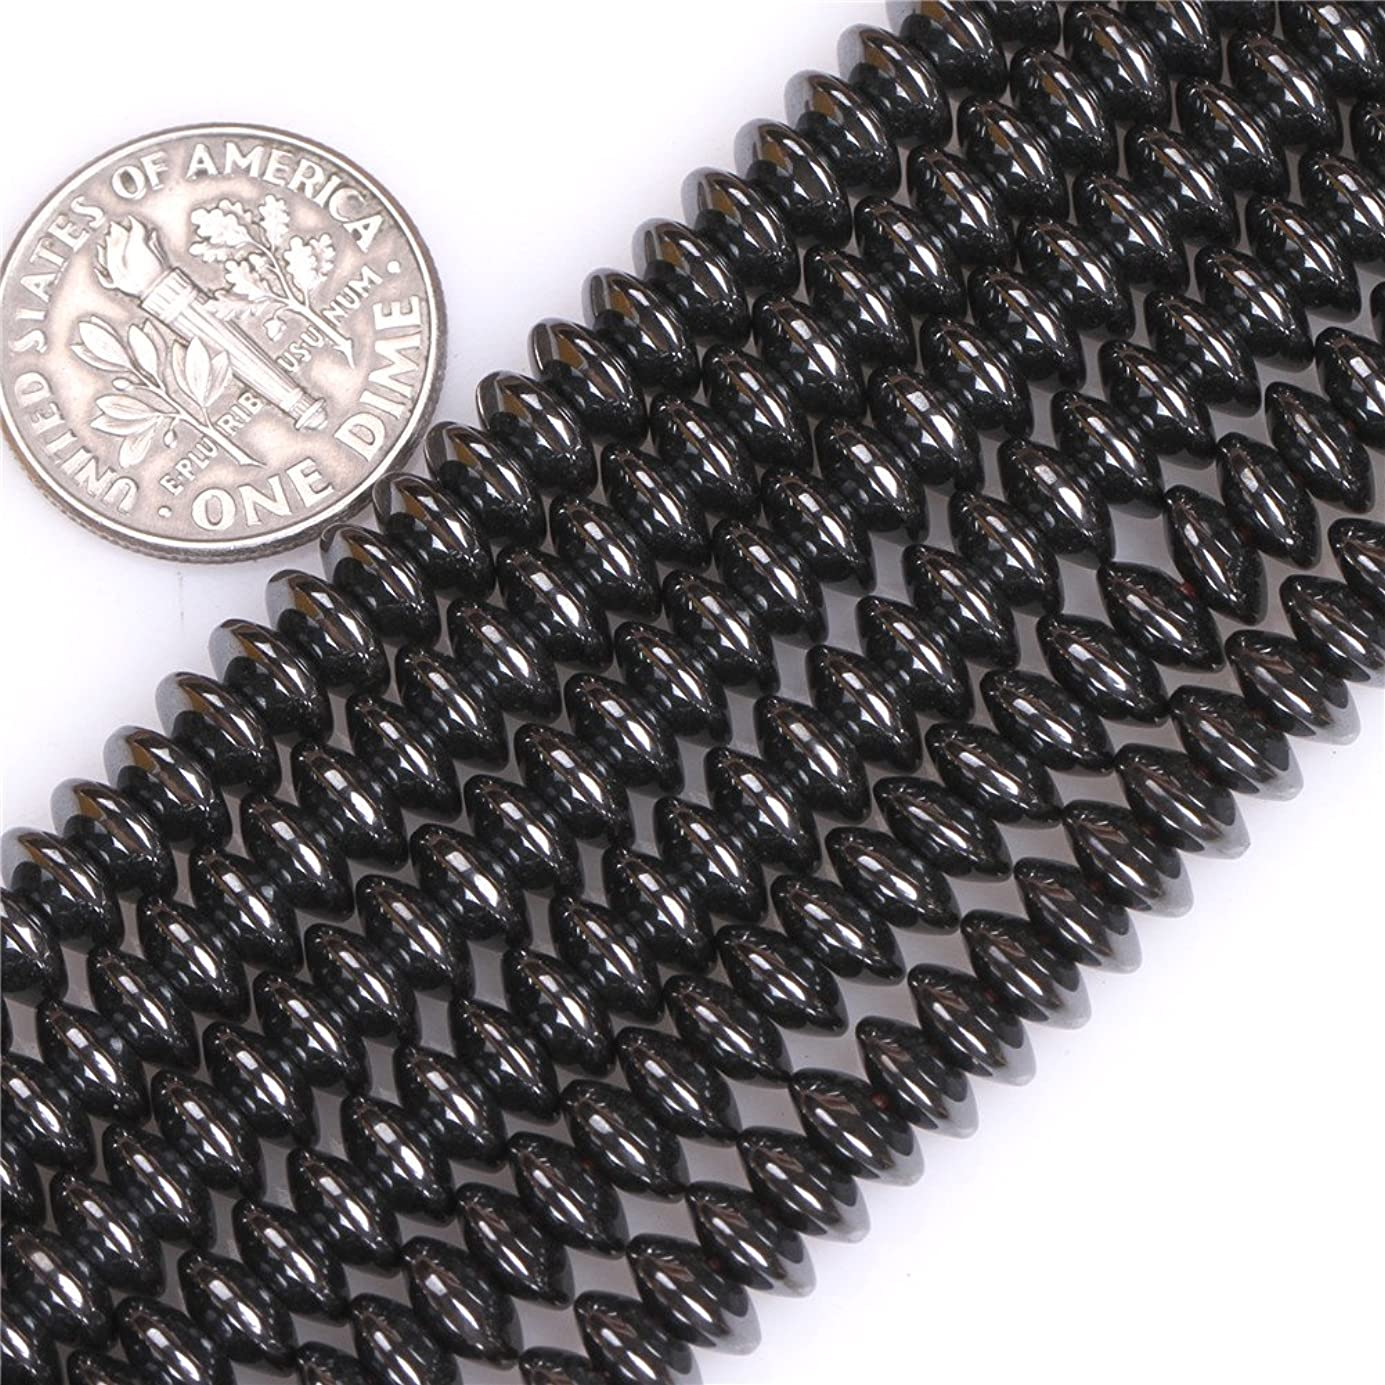 Hematite Beads for Jewelry Making Natural Gemstone Semi Precious 3x6mm Rondelle Heishi Spacer 15